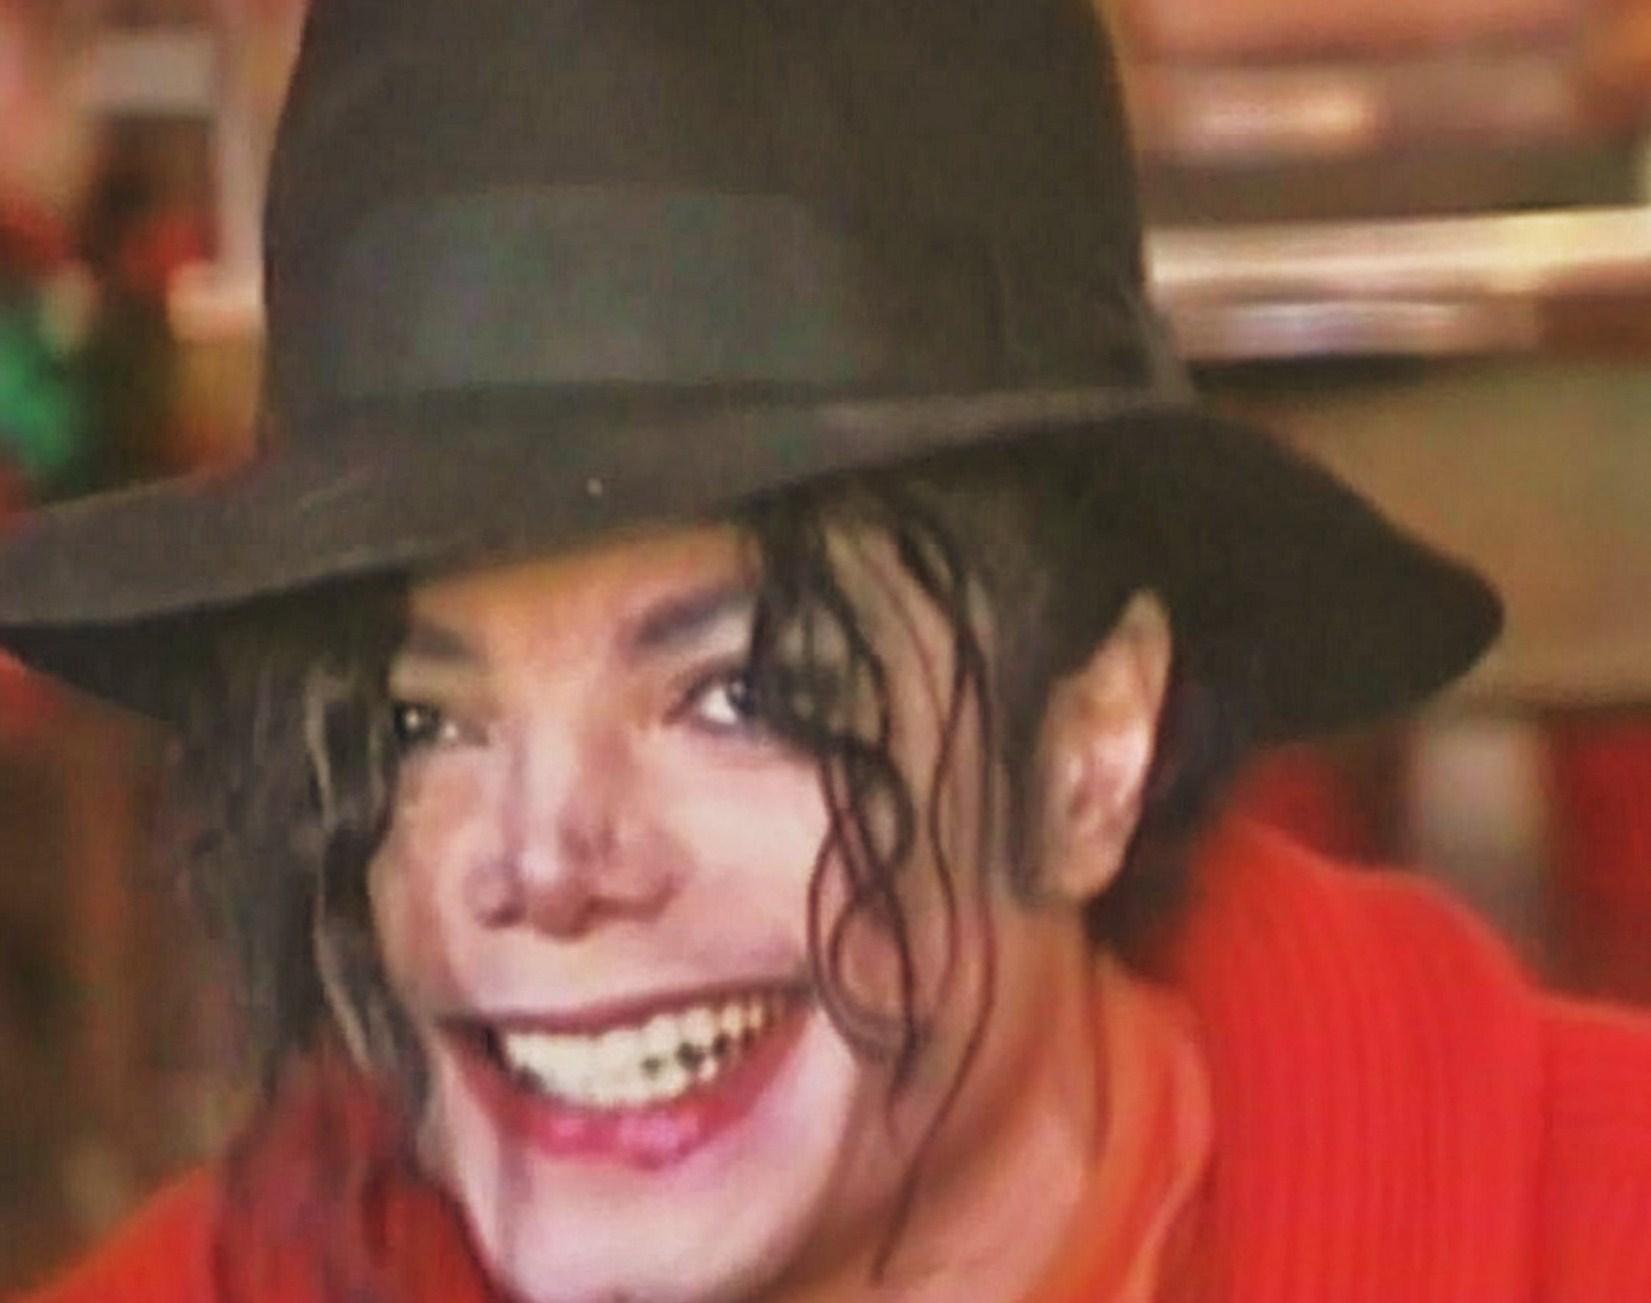 MJ and his super soaker